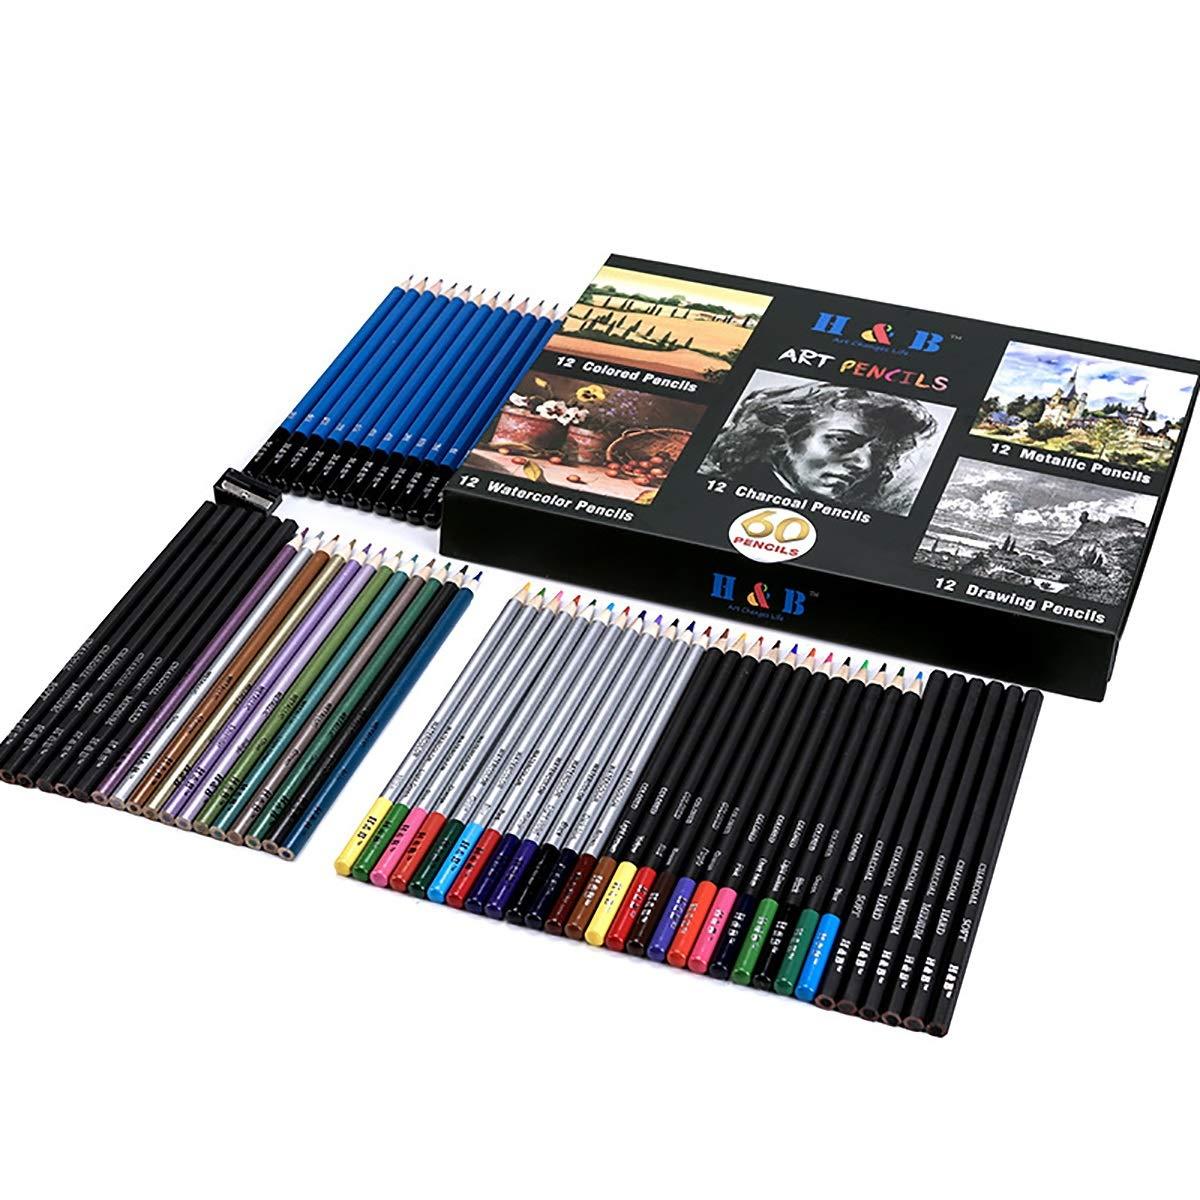 Jhcpca 60鉛筆色鉛筆水可溶性色鉛金属色鉛炭チャレンジスケッチ鉛筆セット (Color : HB-CPCB60HB)  HB-CPCB60HB B07MQZJ6WR